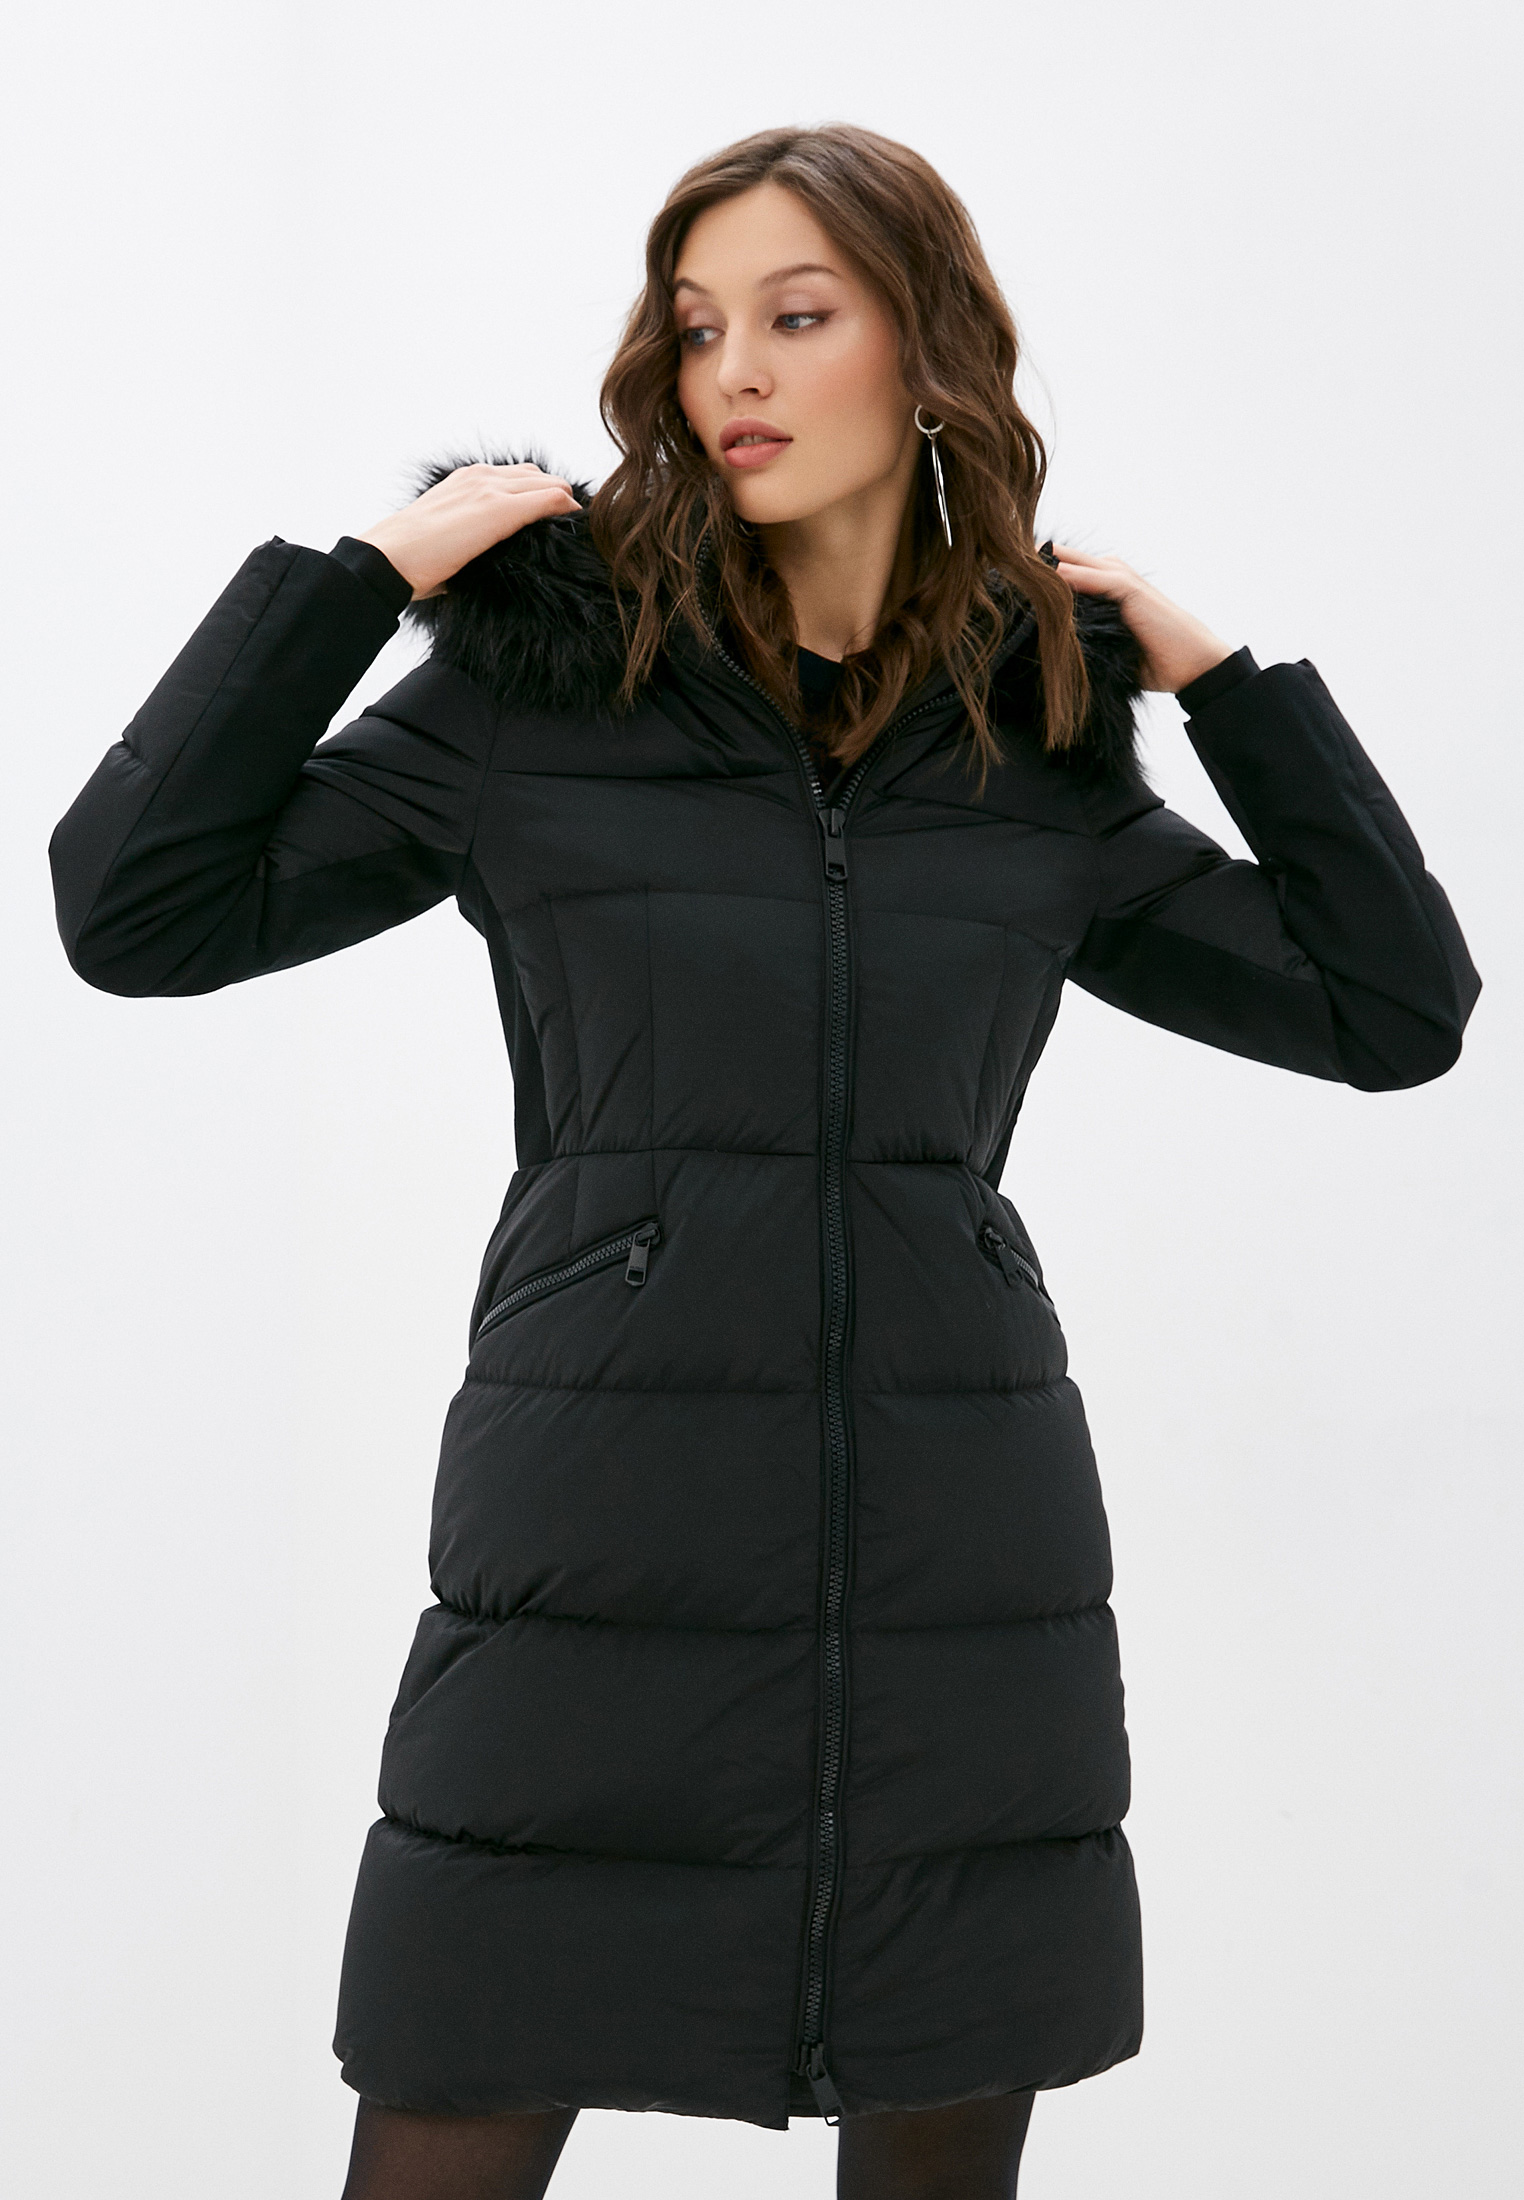 Утепленная куртка Tommy Hilfiger (Томми Хилфигер) WW0WW28636